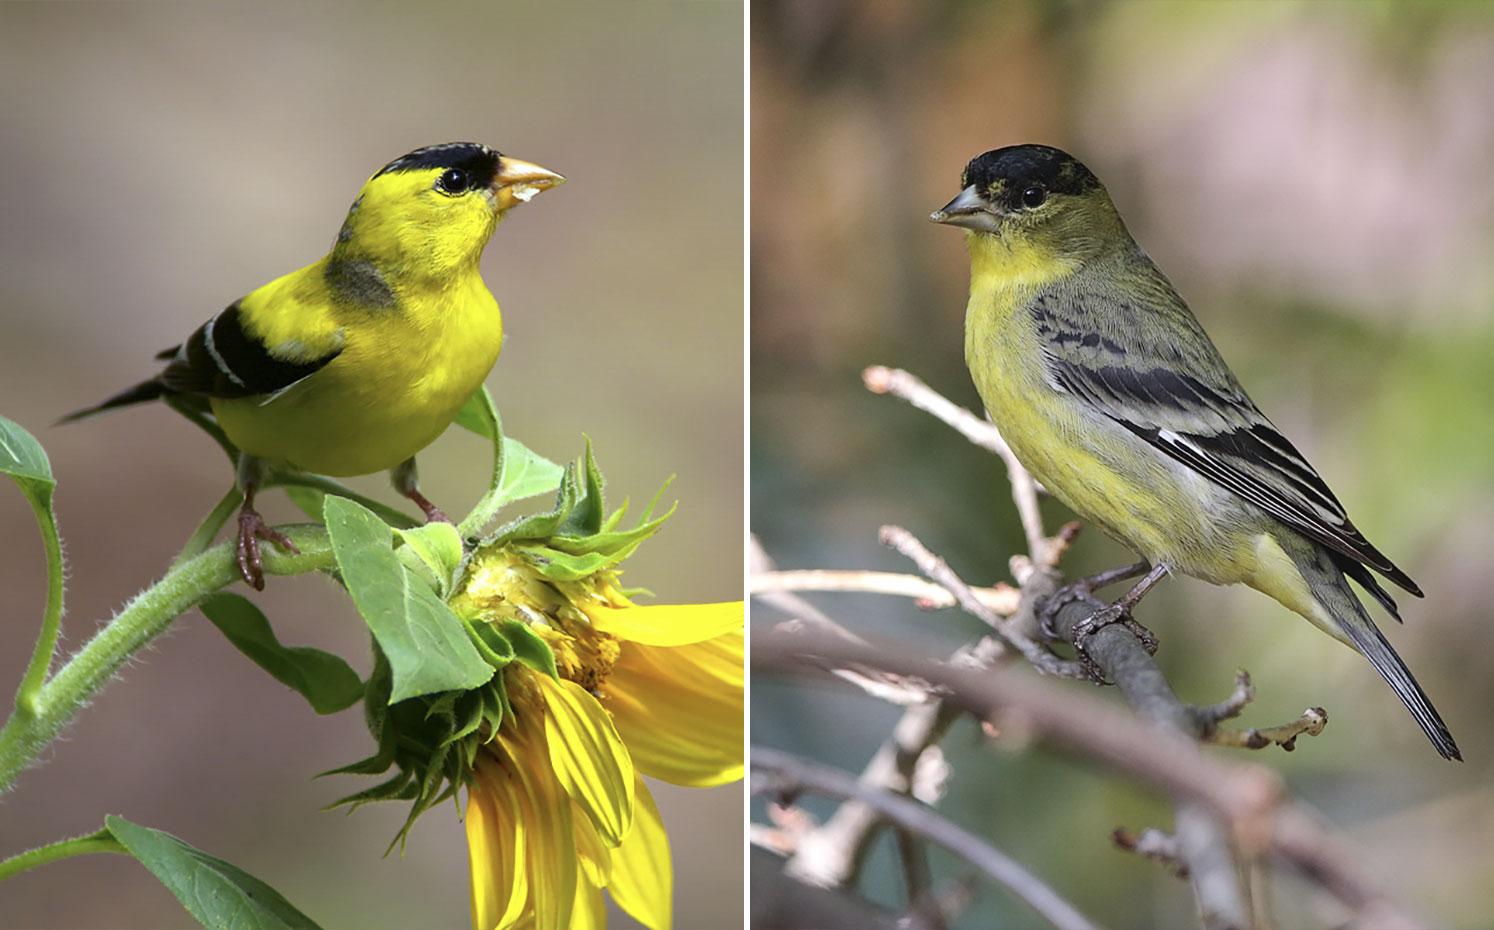 From left: American Goldfinch. Photo: Megumi Aita/Audubon Photography Awards; Lesser Goldfinch. Photo: Lou Orr/Great Backyard Bird Count